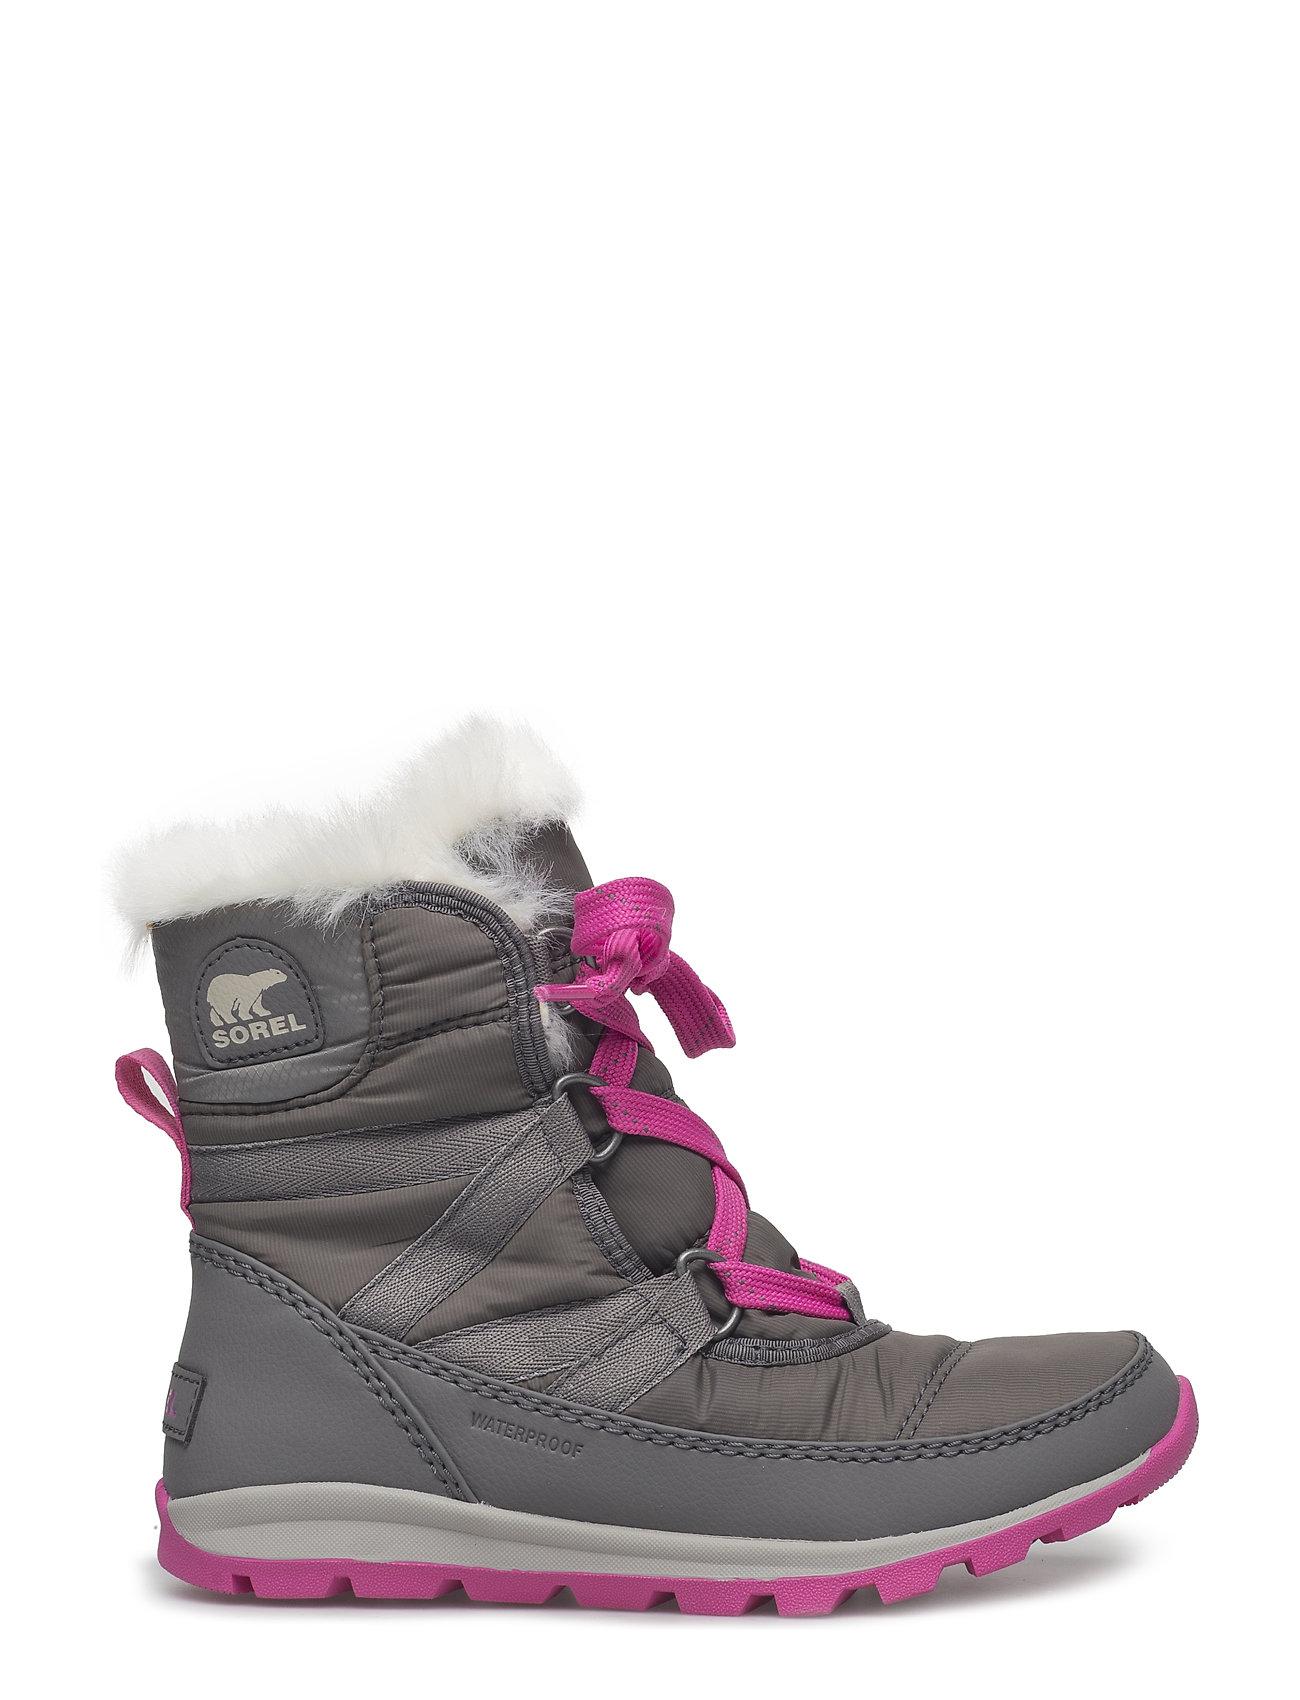 1663e9389a99 Youth Whitney Short Lace Sorel Støvler til Børn i